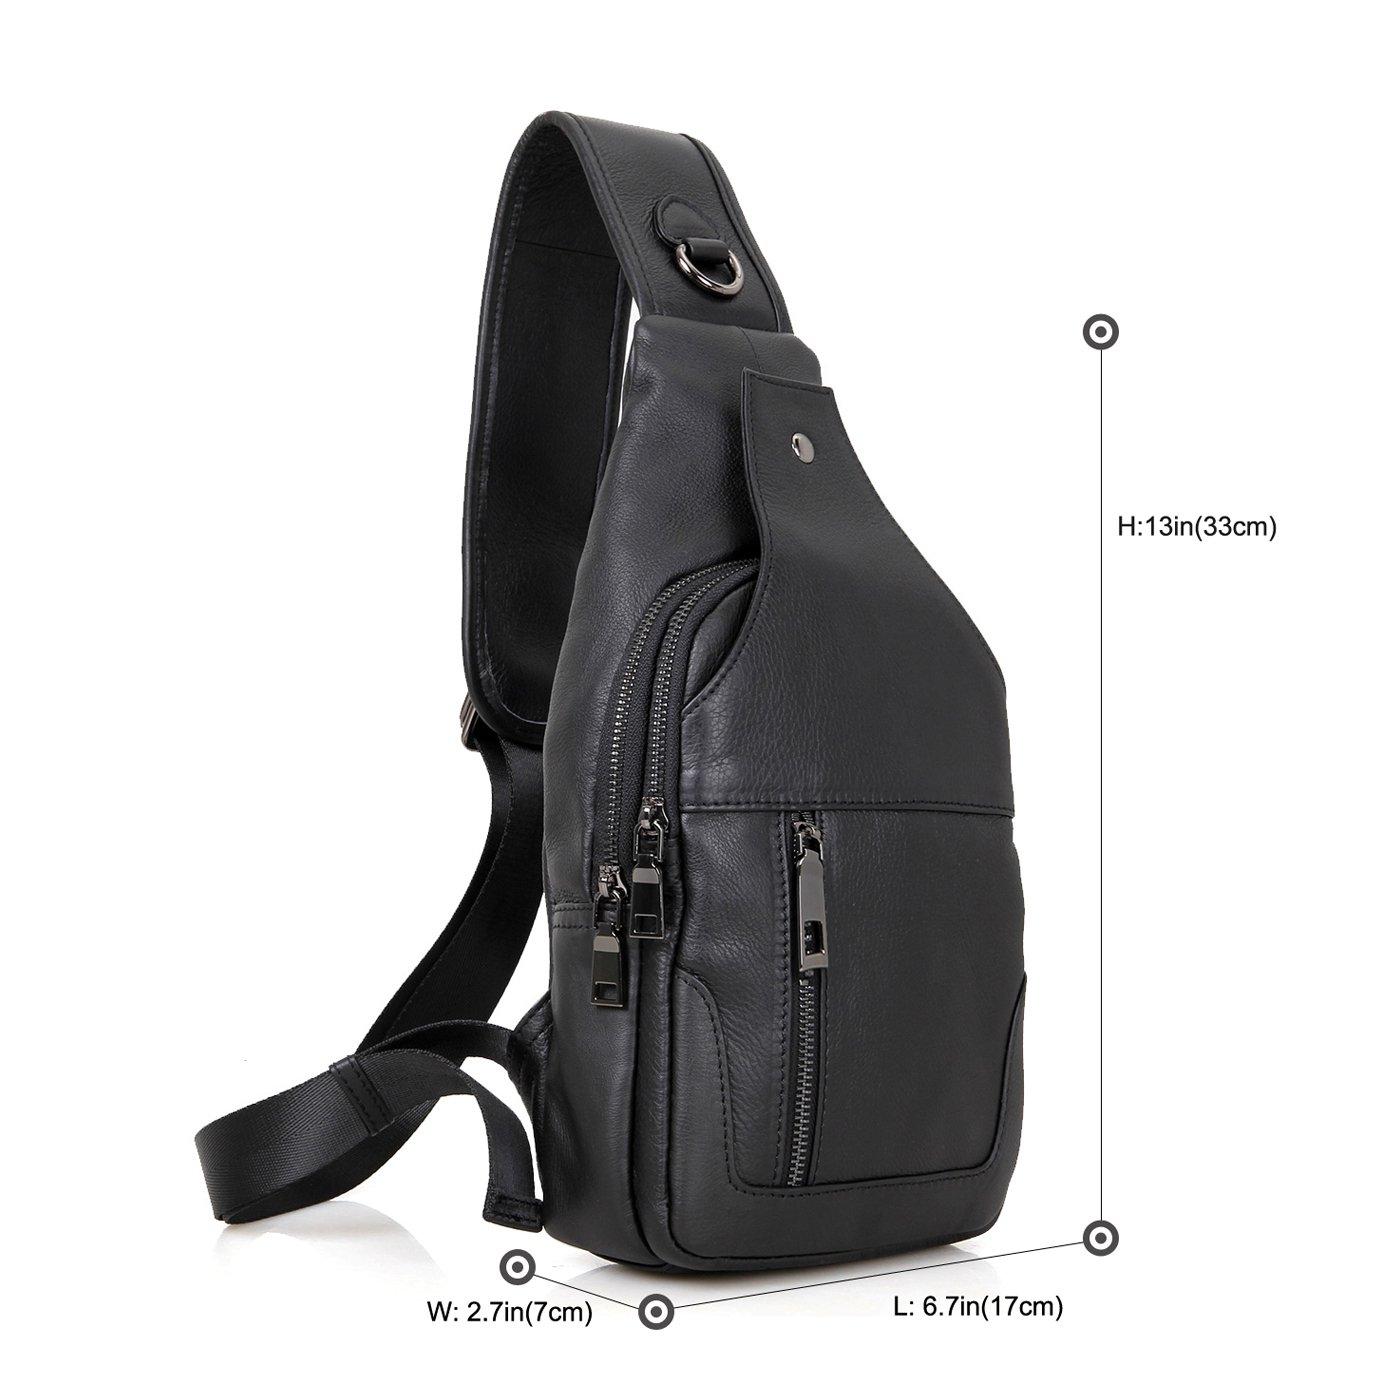 Texbo Genuine Full Grain Leather Small Body Sling Bag Travel Hiking Backpack